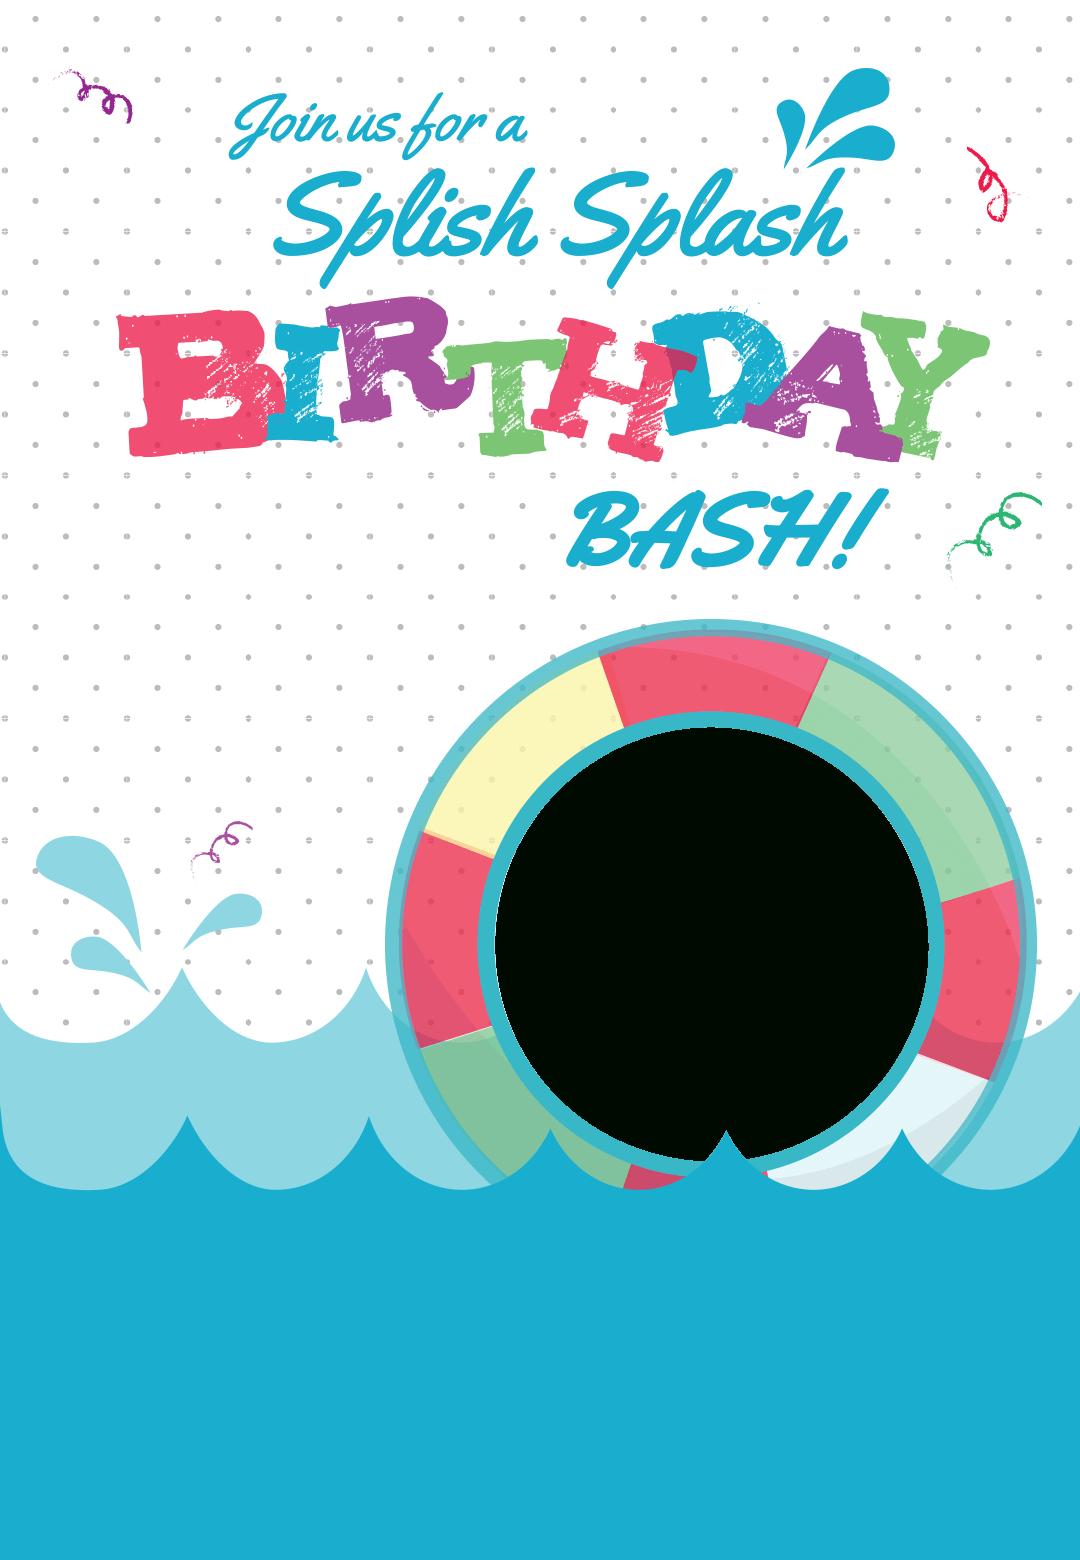 Splish Splash - Free Printable Summer Party Invitation Template - Free Printable Pool Party Invitation Cards